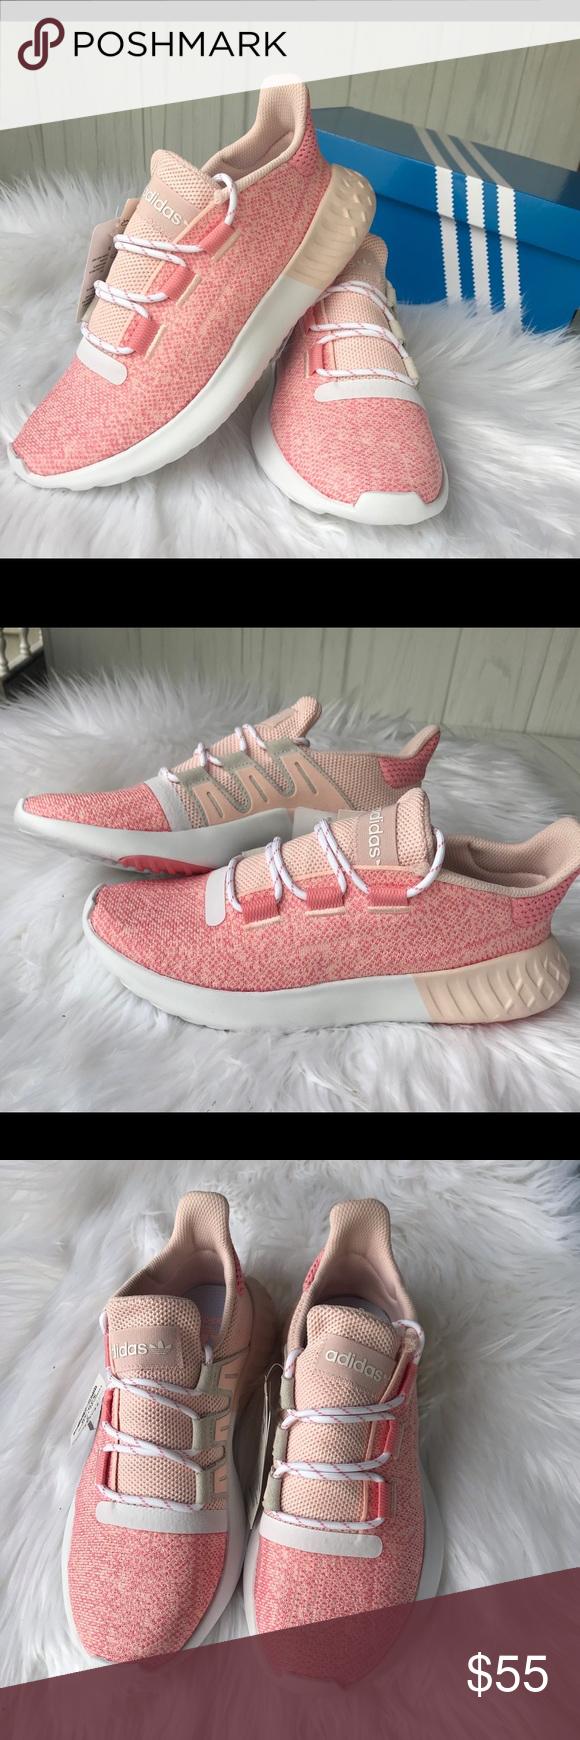 Sneakers, Pink adidas, Adidas tubular